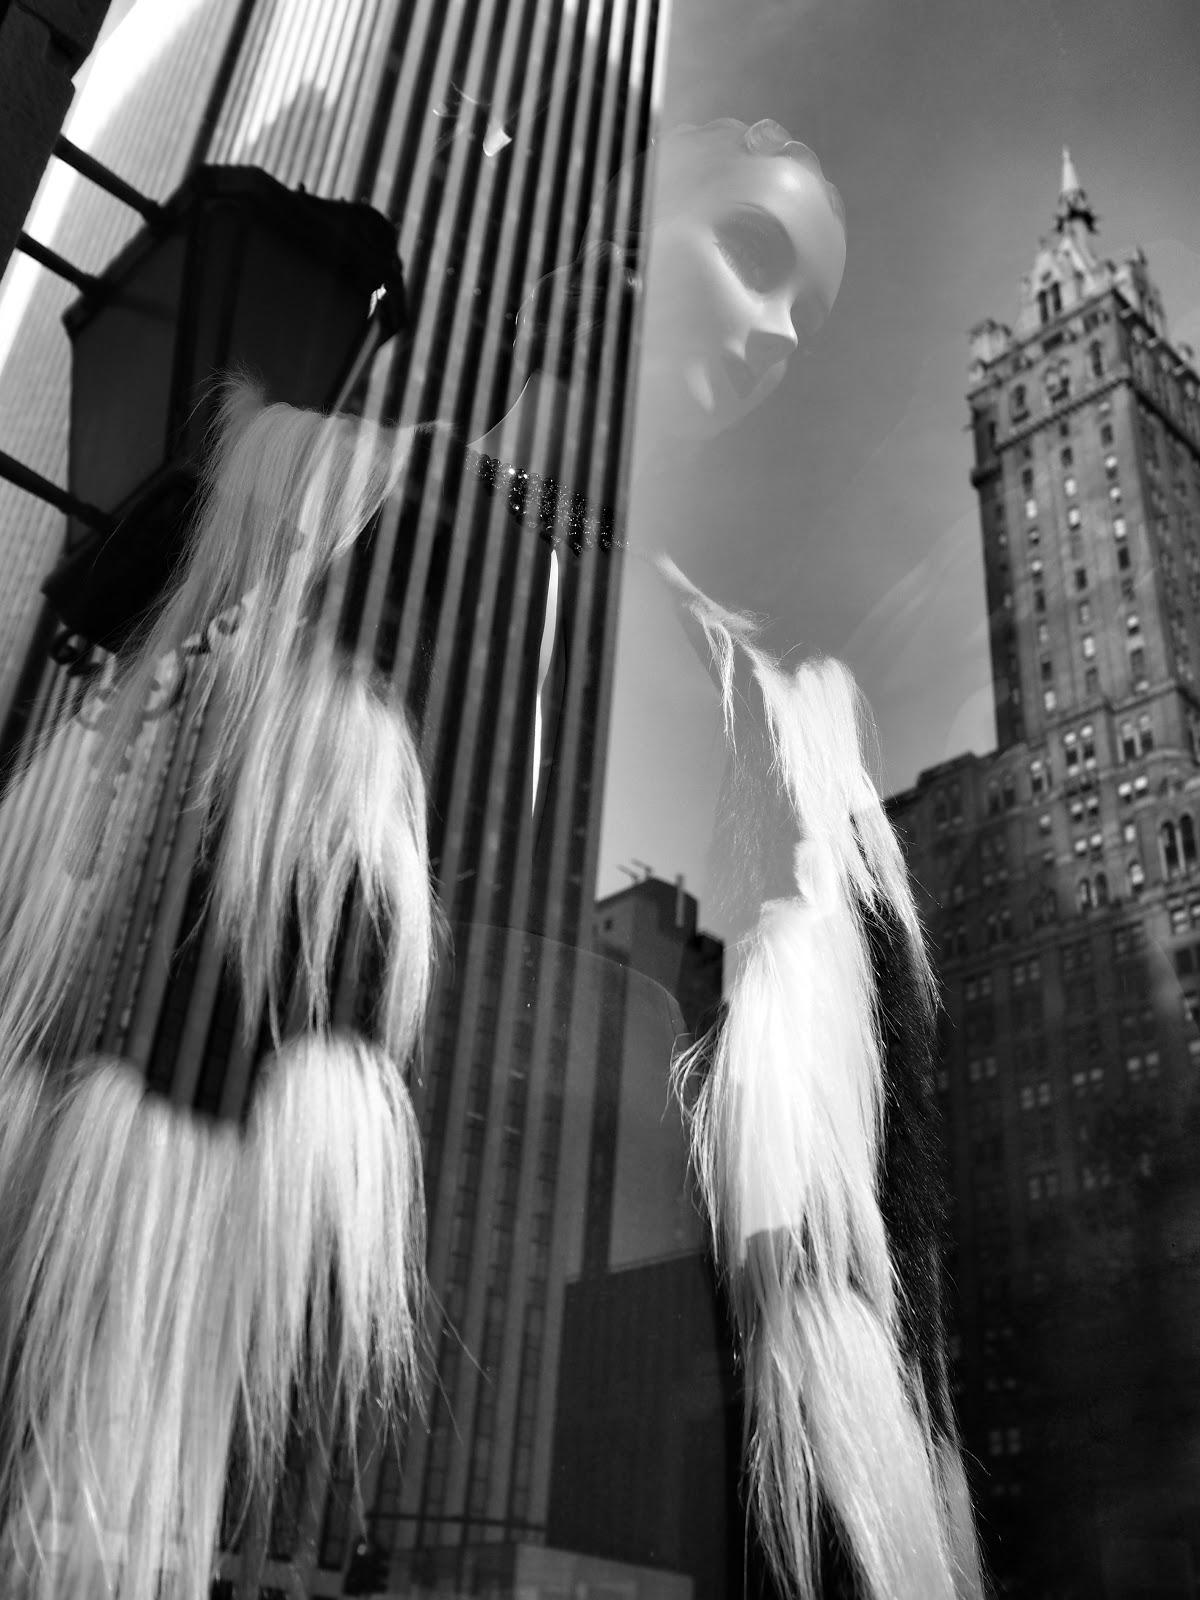 Floating #floating #bgwindows #windowwatchers #holidaywindows #5thavenuewindows #NYC  #holidays #besttimeoftheyear #nyc ©2014 Nancy Lundebjerg